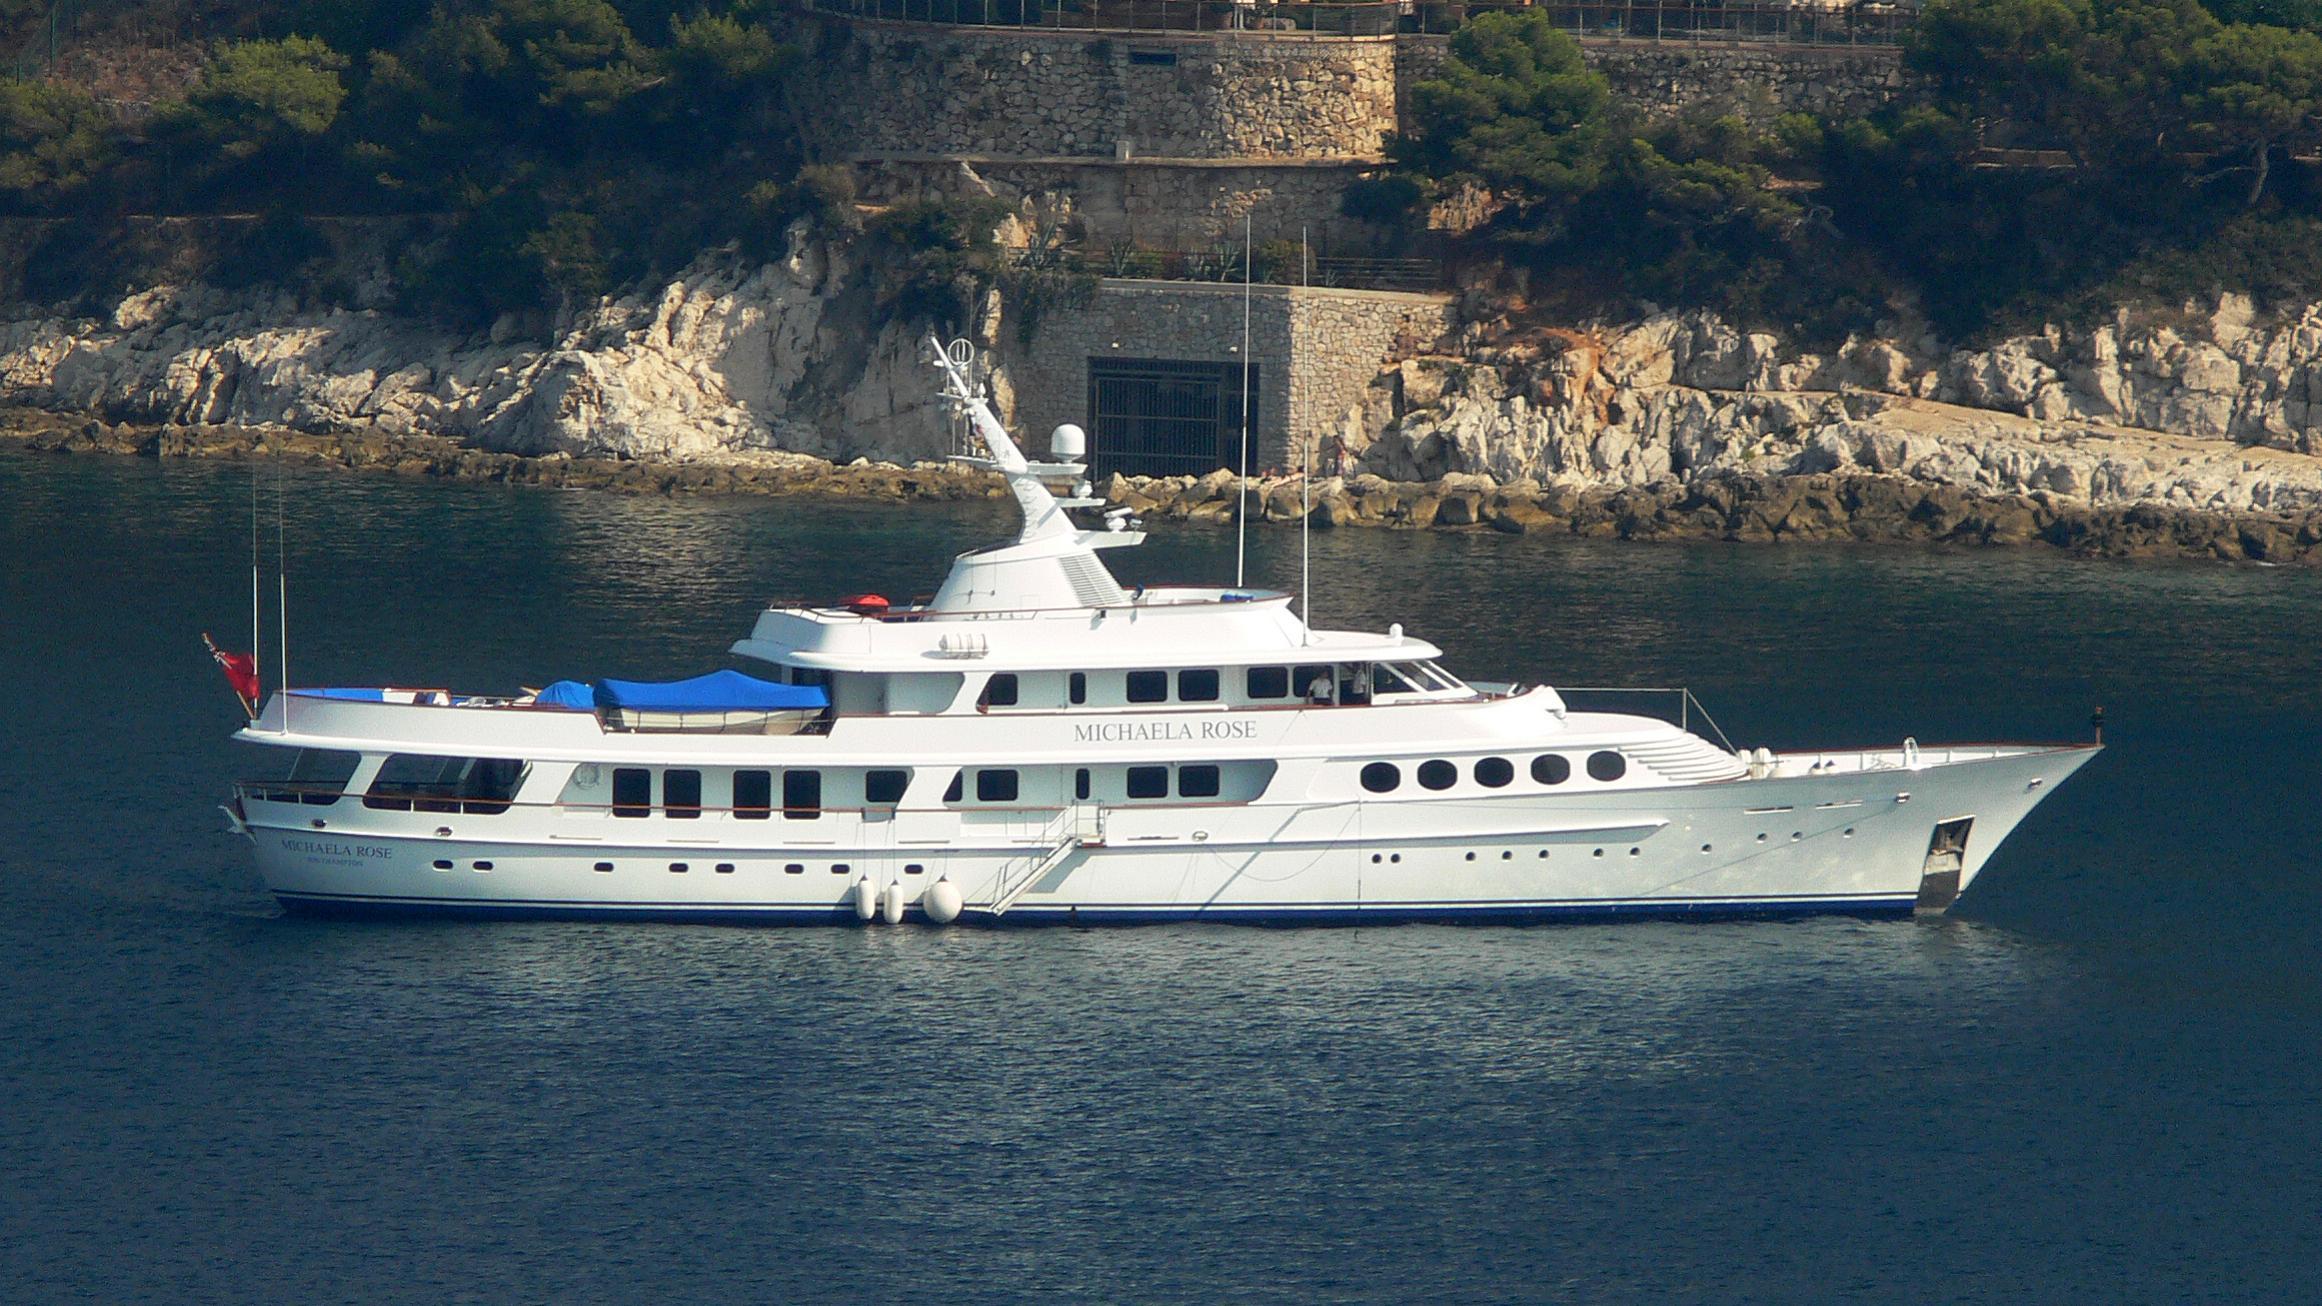 michaela-rose-yacht-exterior